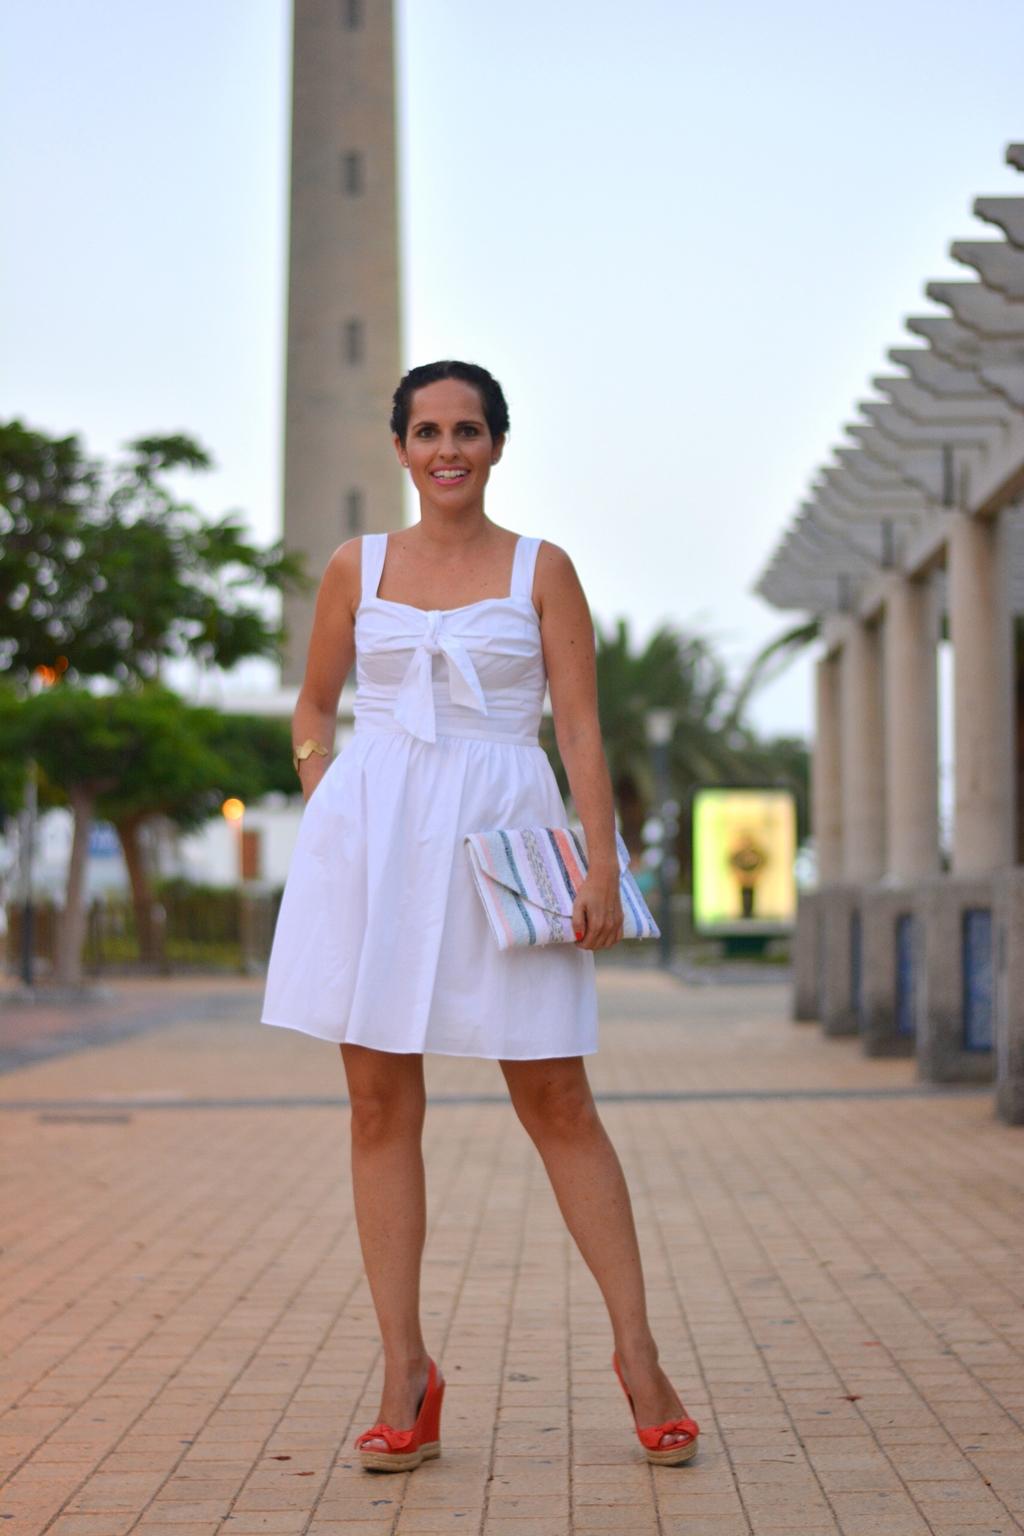 zara-white-dress-outfit-street-style